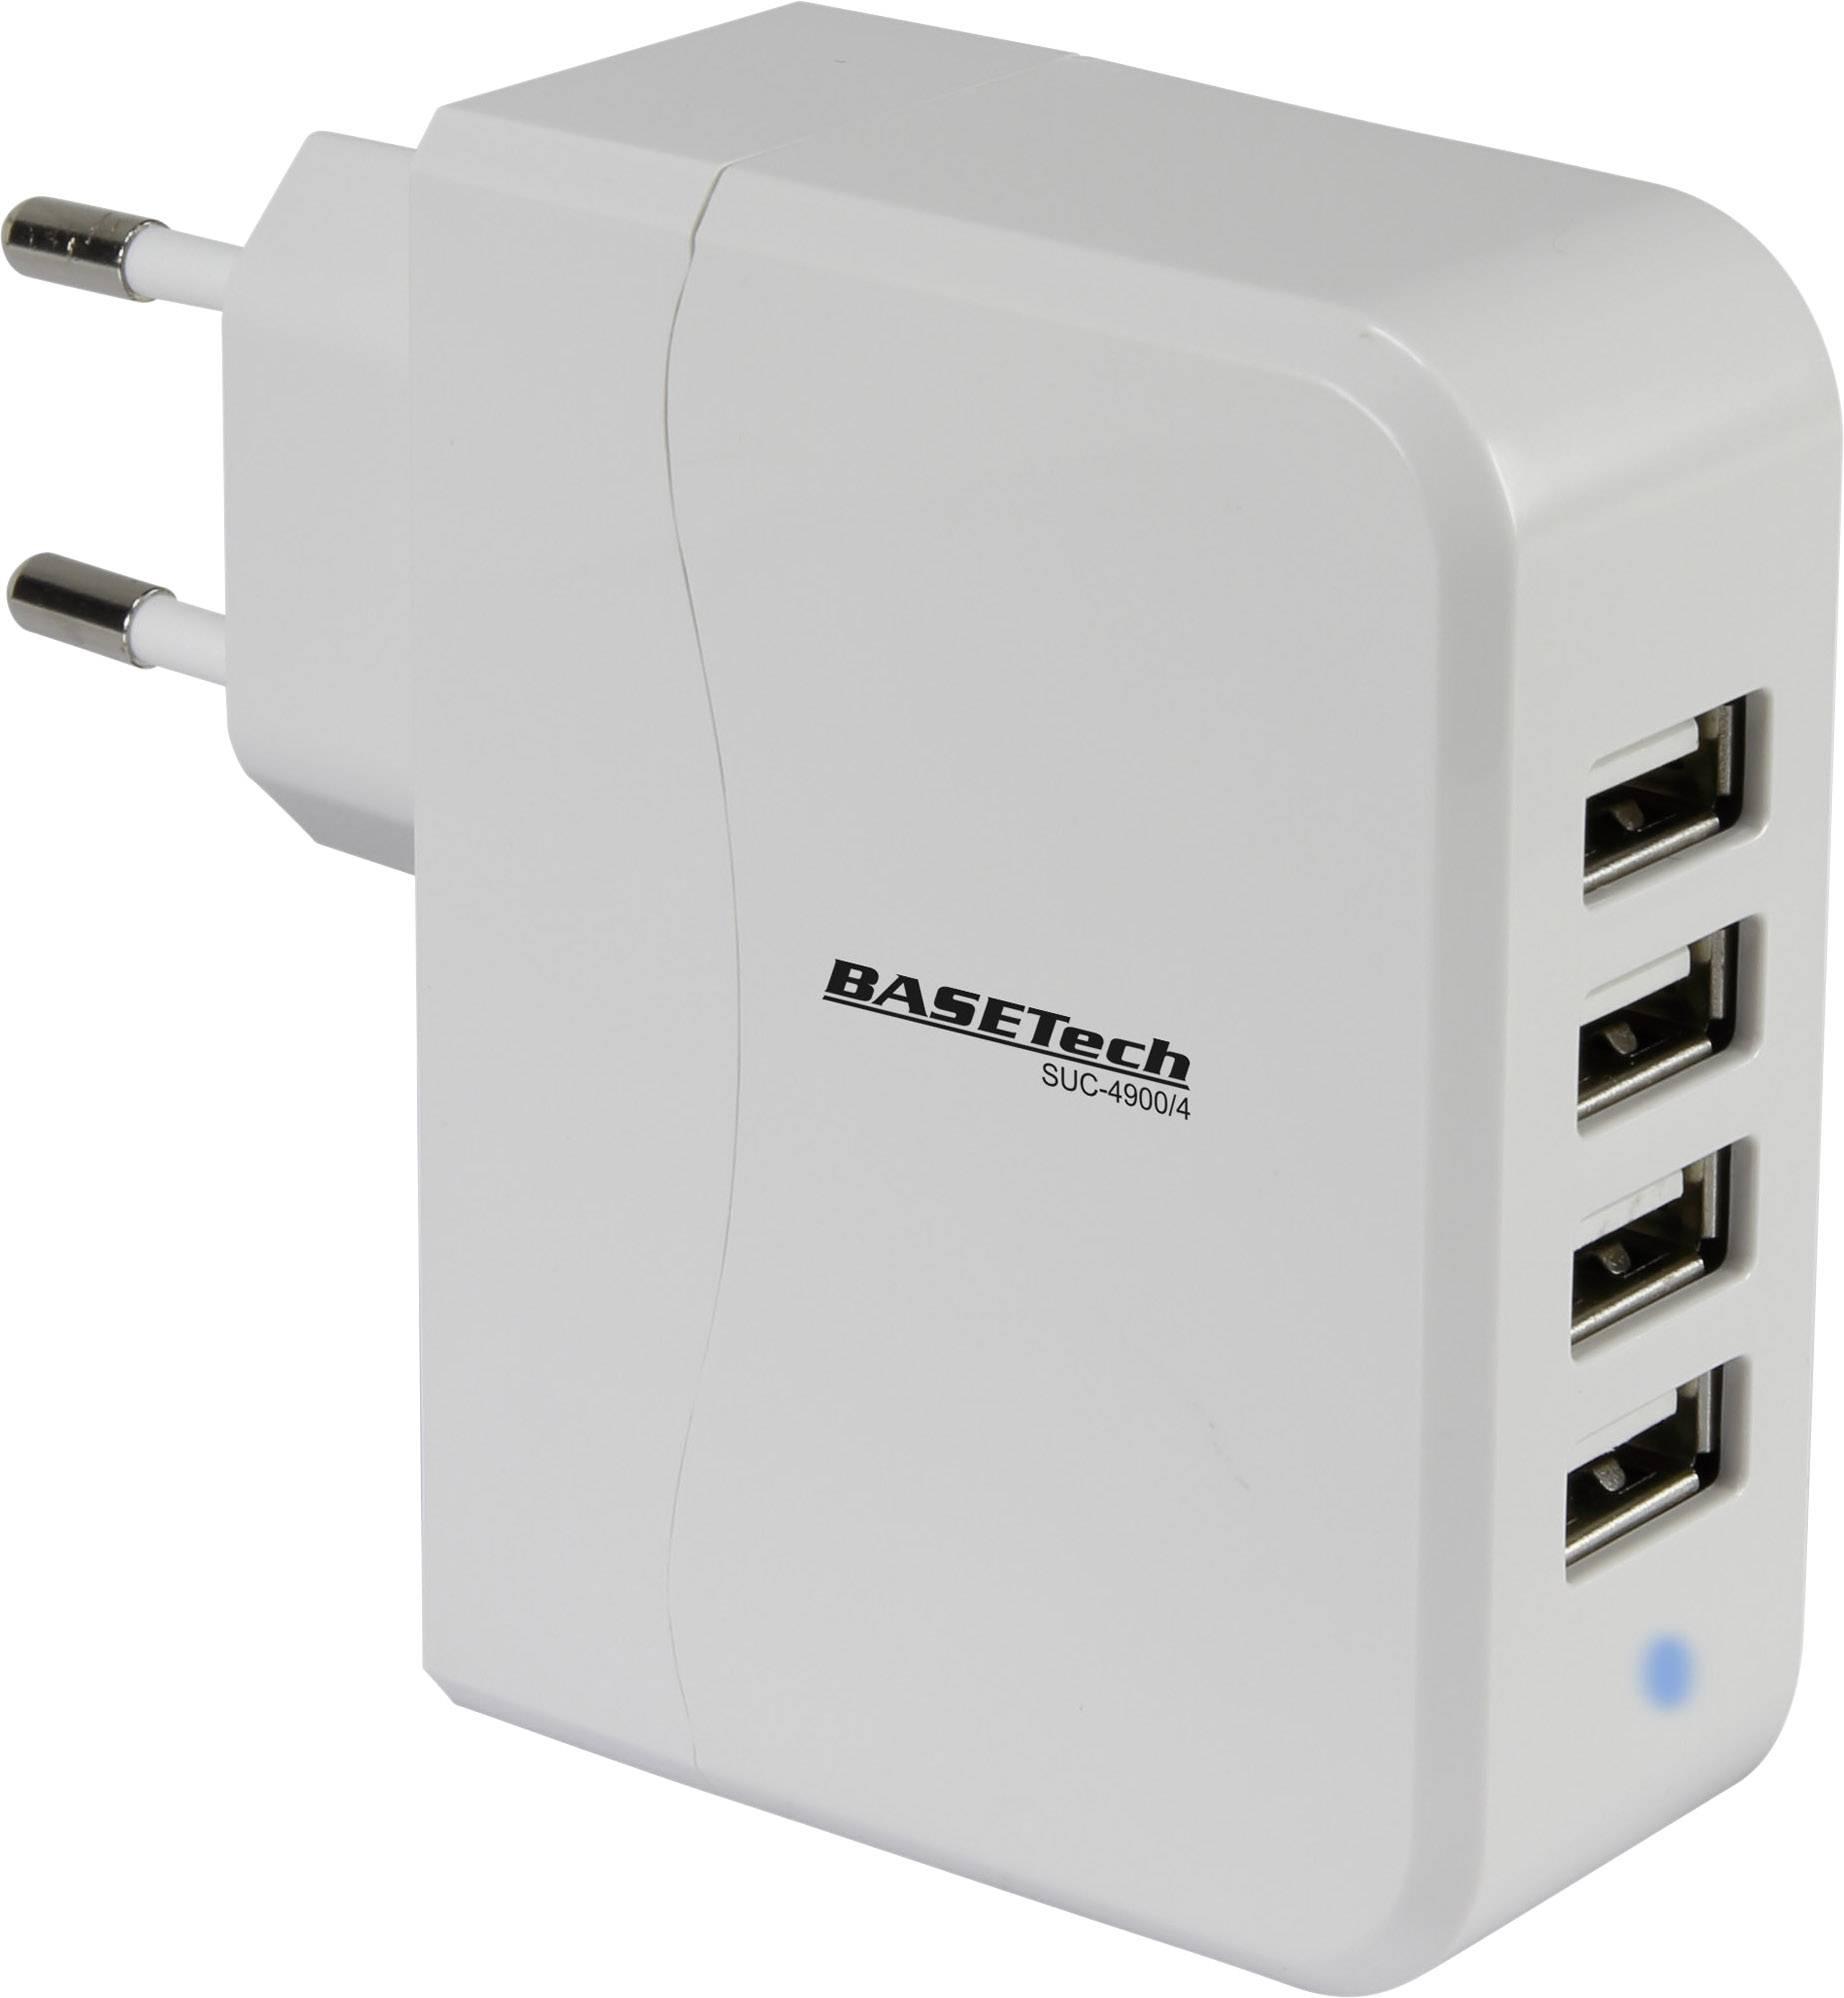 USB nabíječka Basetech SUC-4900/4 do zásuvky (230 V), 4900 mA, 4 x USB, šedá